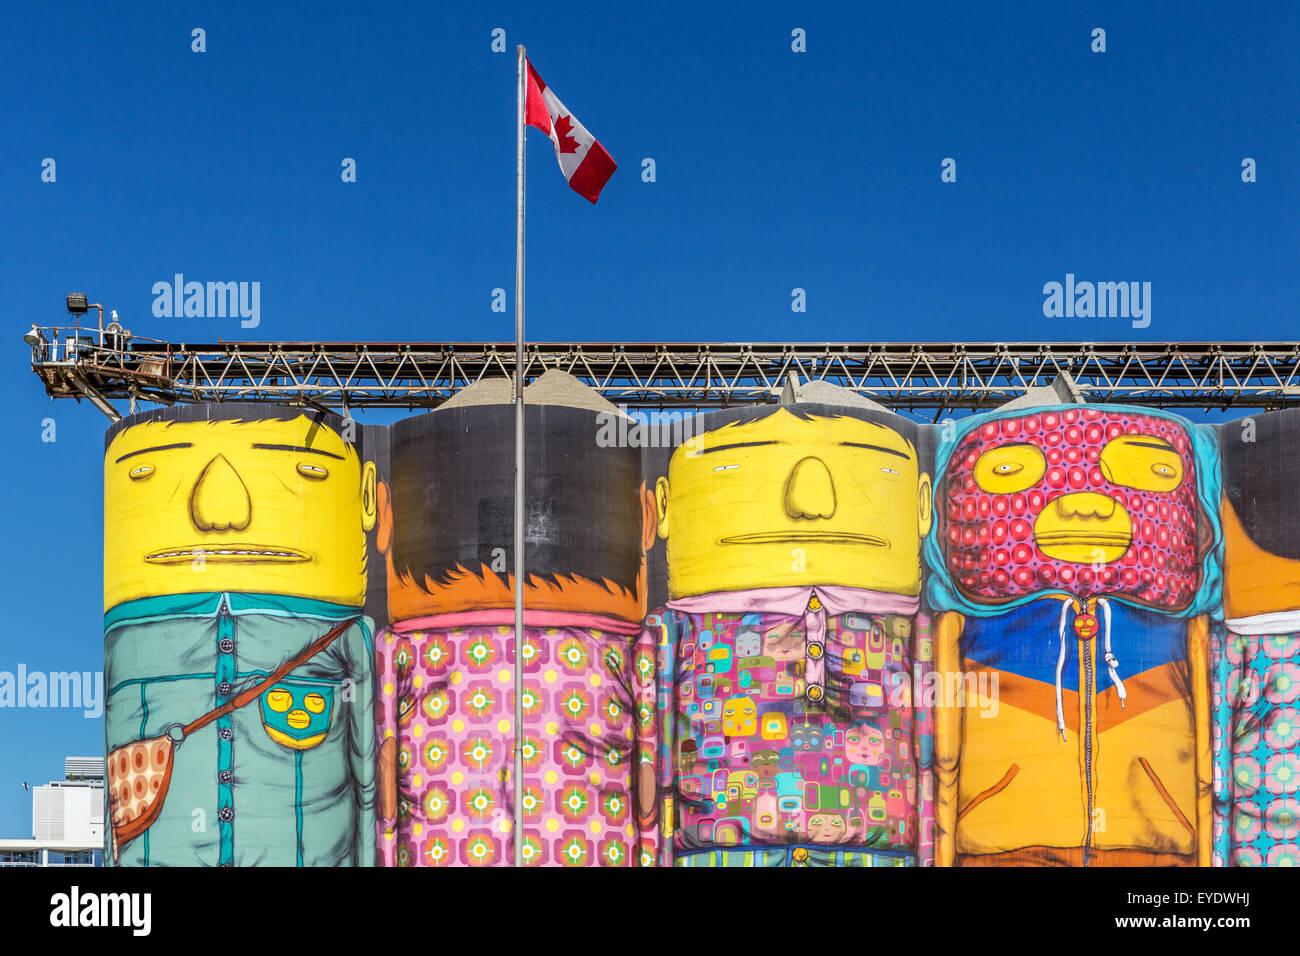 Océano silos de hormigón pintado por Os Gemeos, Granville Island, Vancouver, British Columbia, Canadá Imagen De Stock